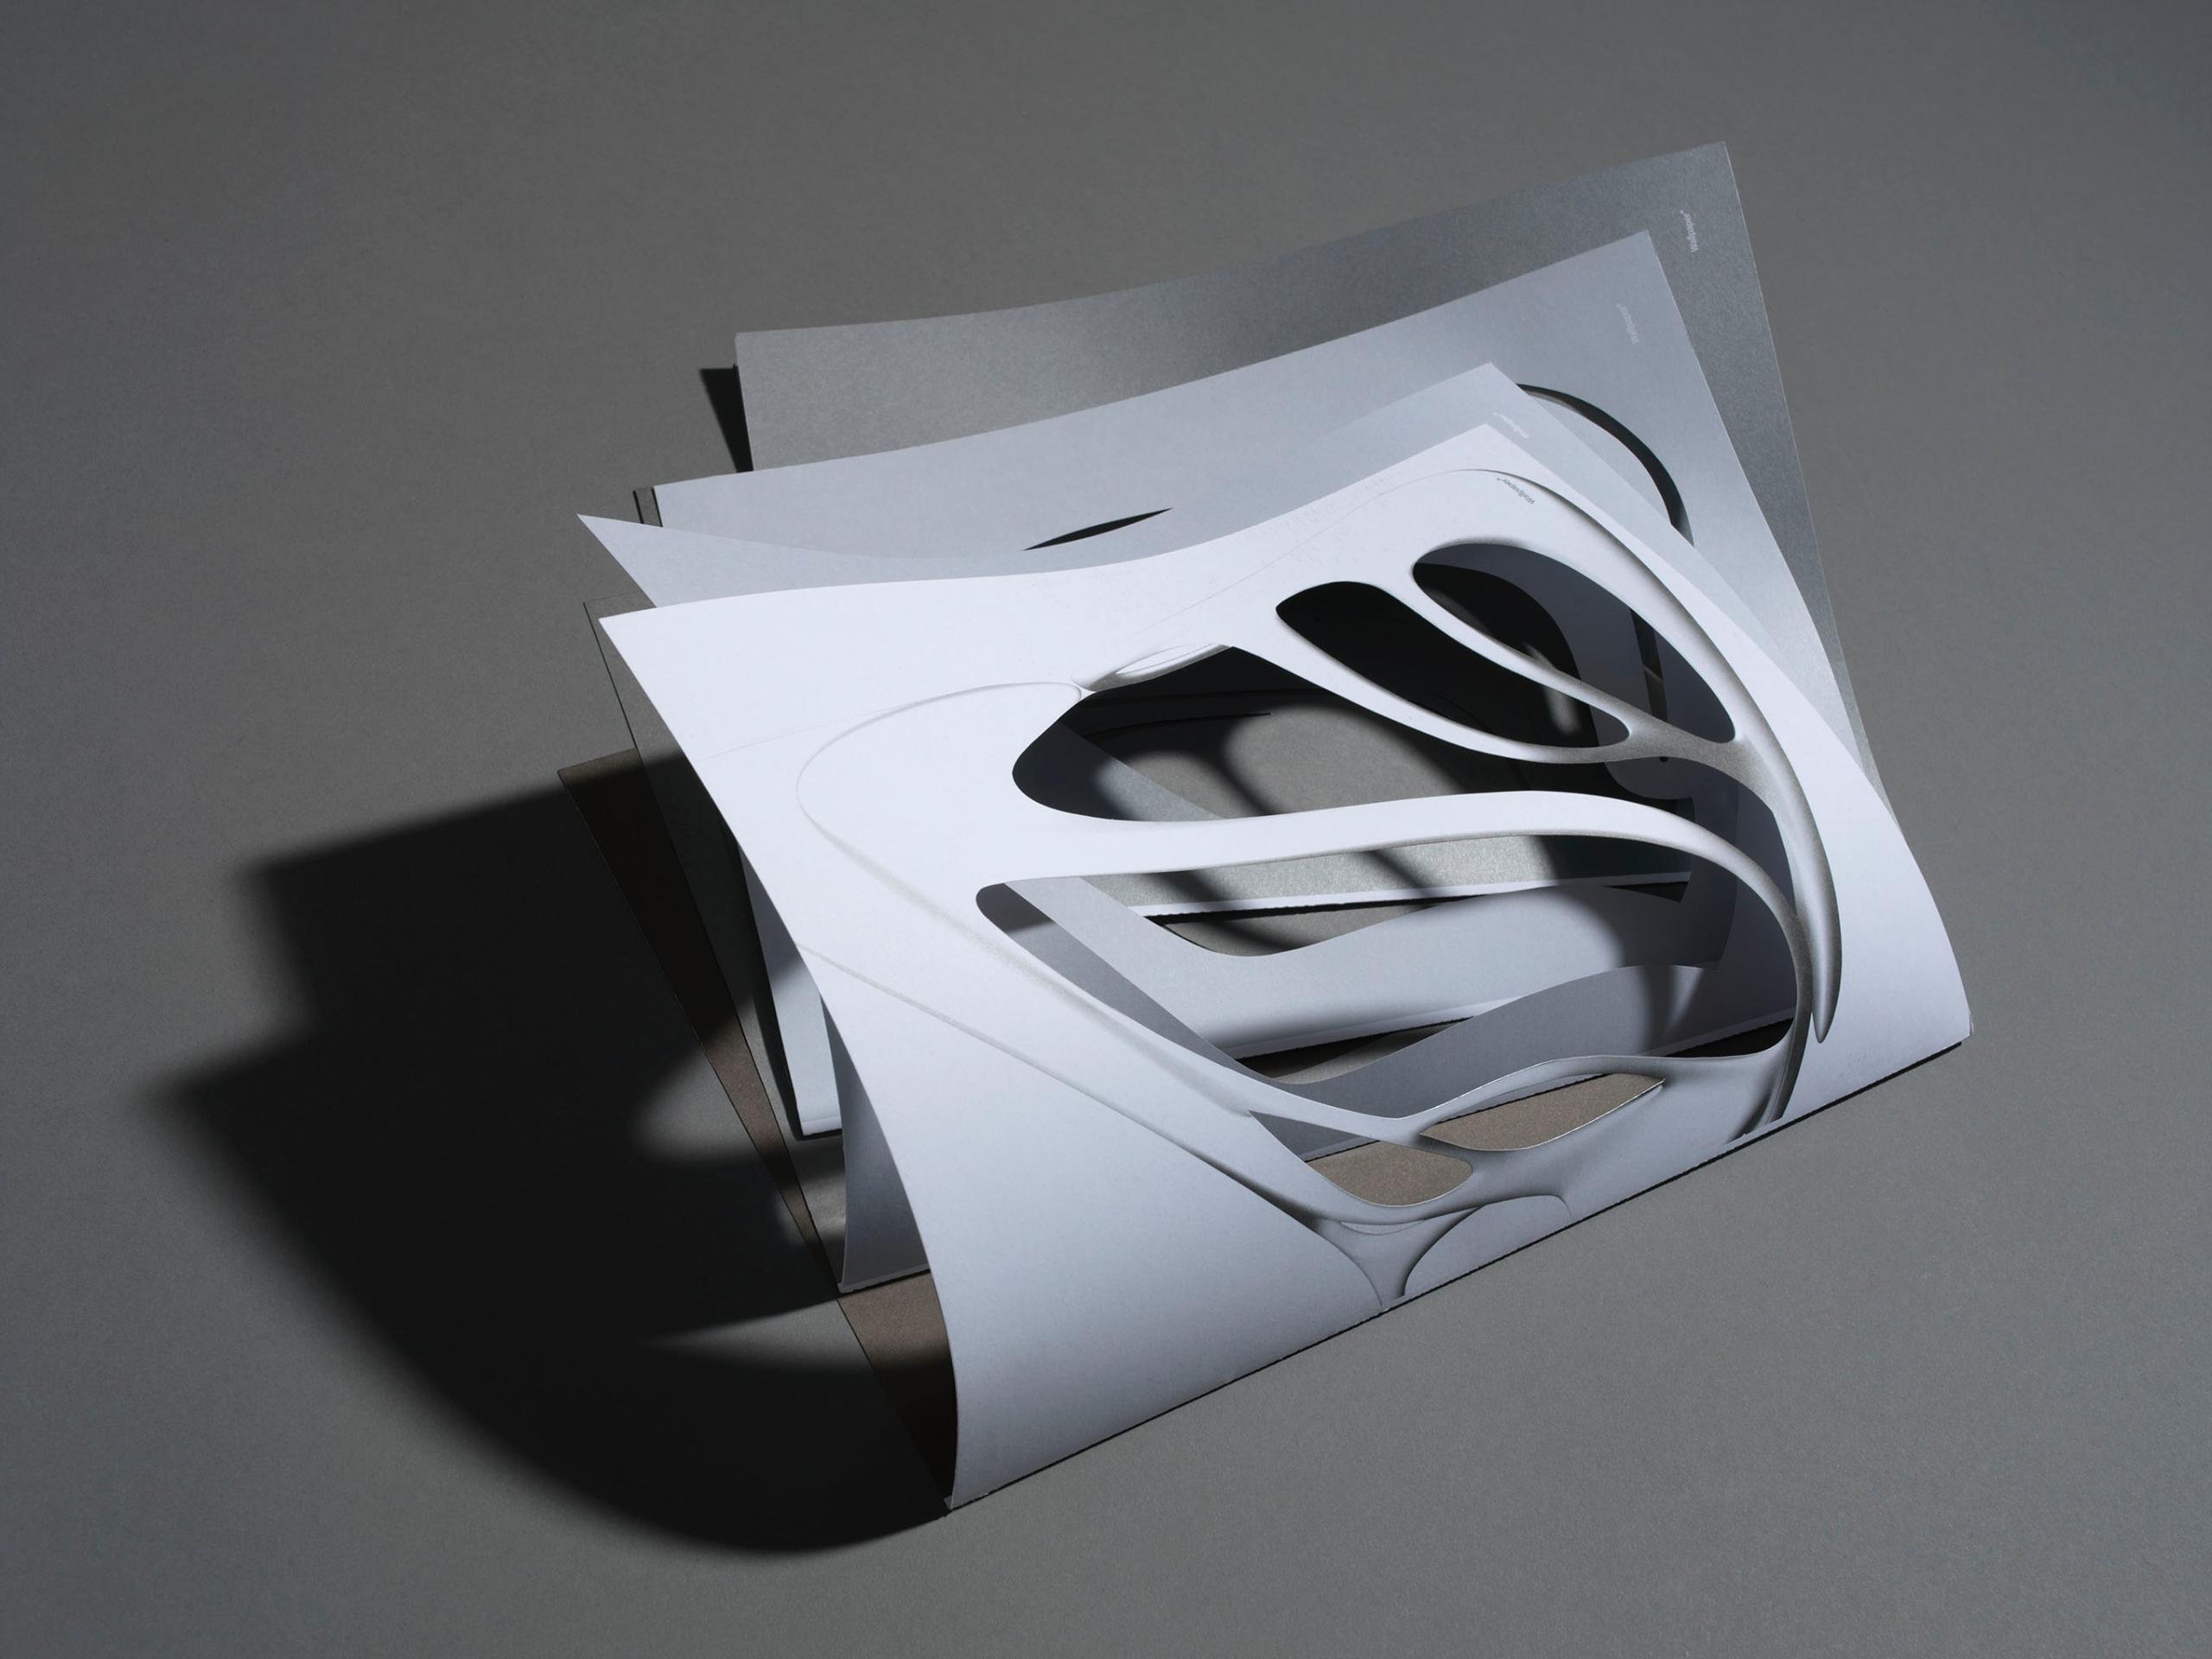 Design: Zaha Hadid profile: Mat - minimalist | ello